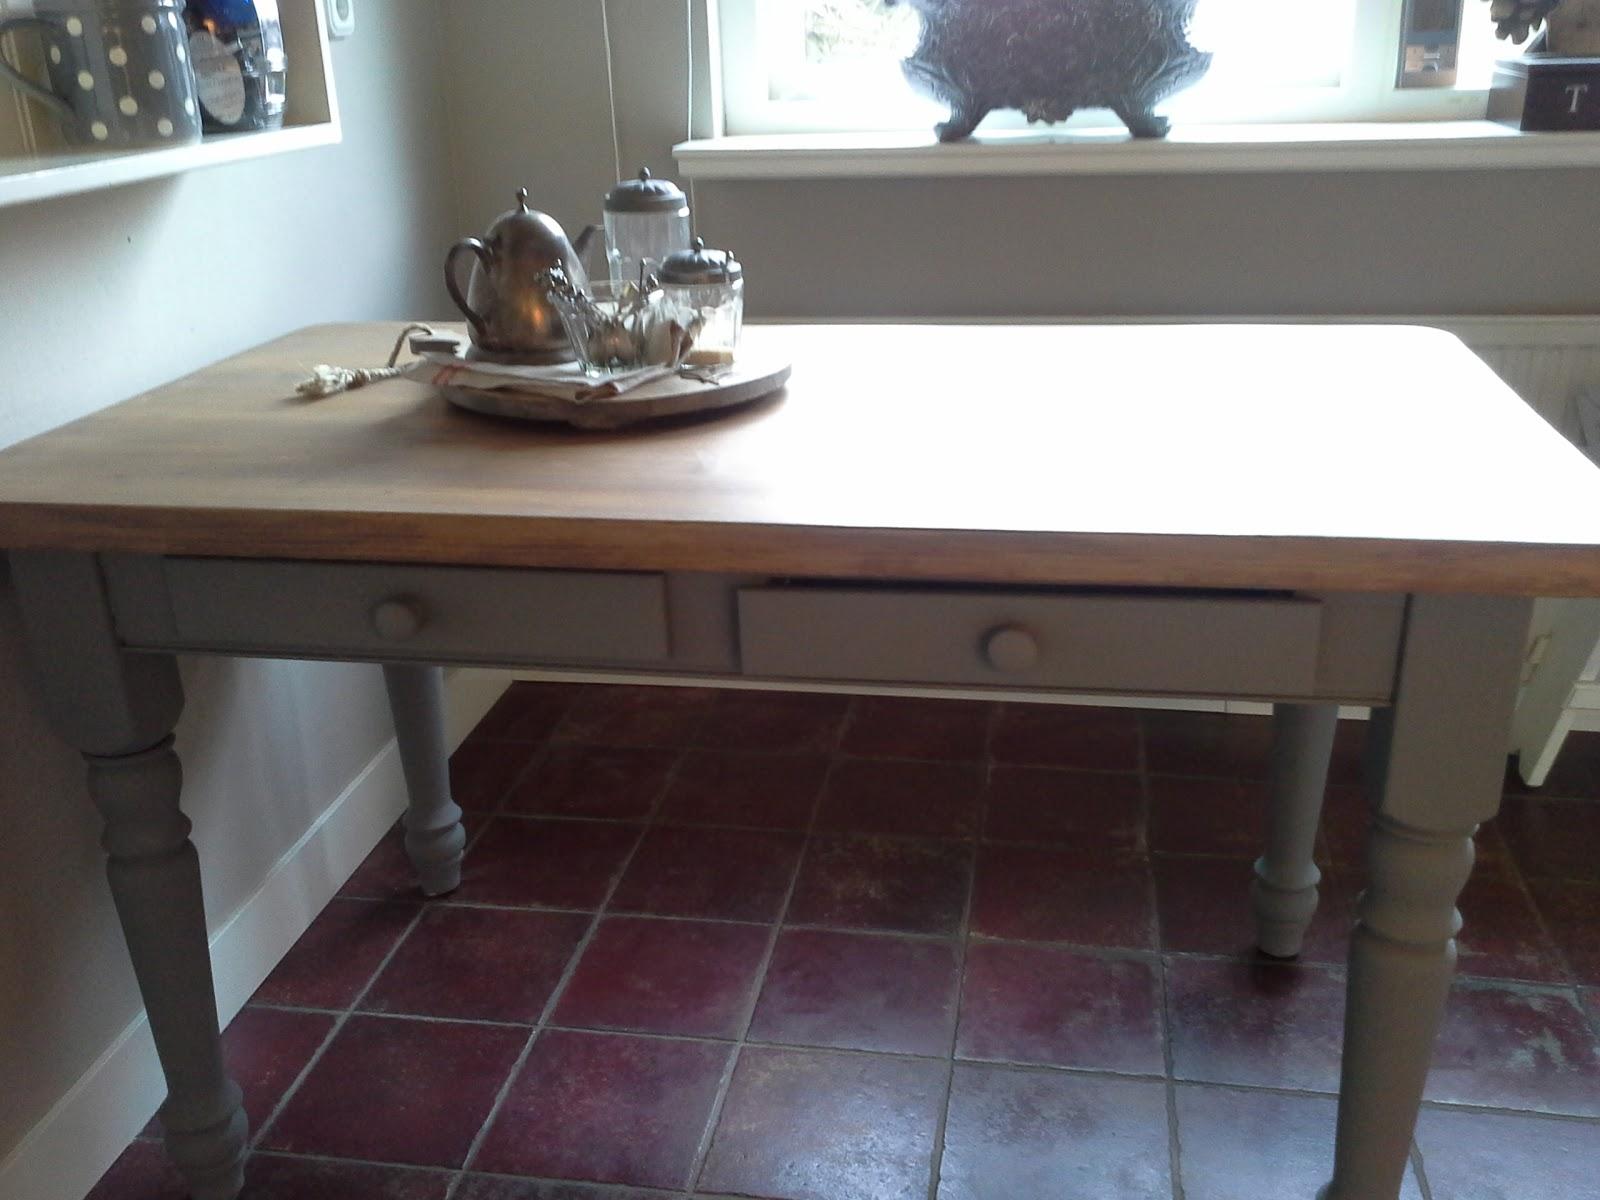 De hortensiatuin de keukentafel for Keukentafel en stoelen